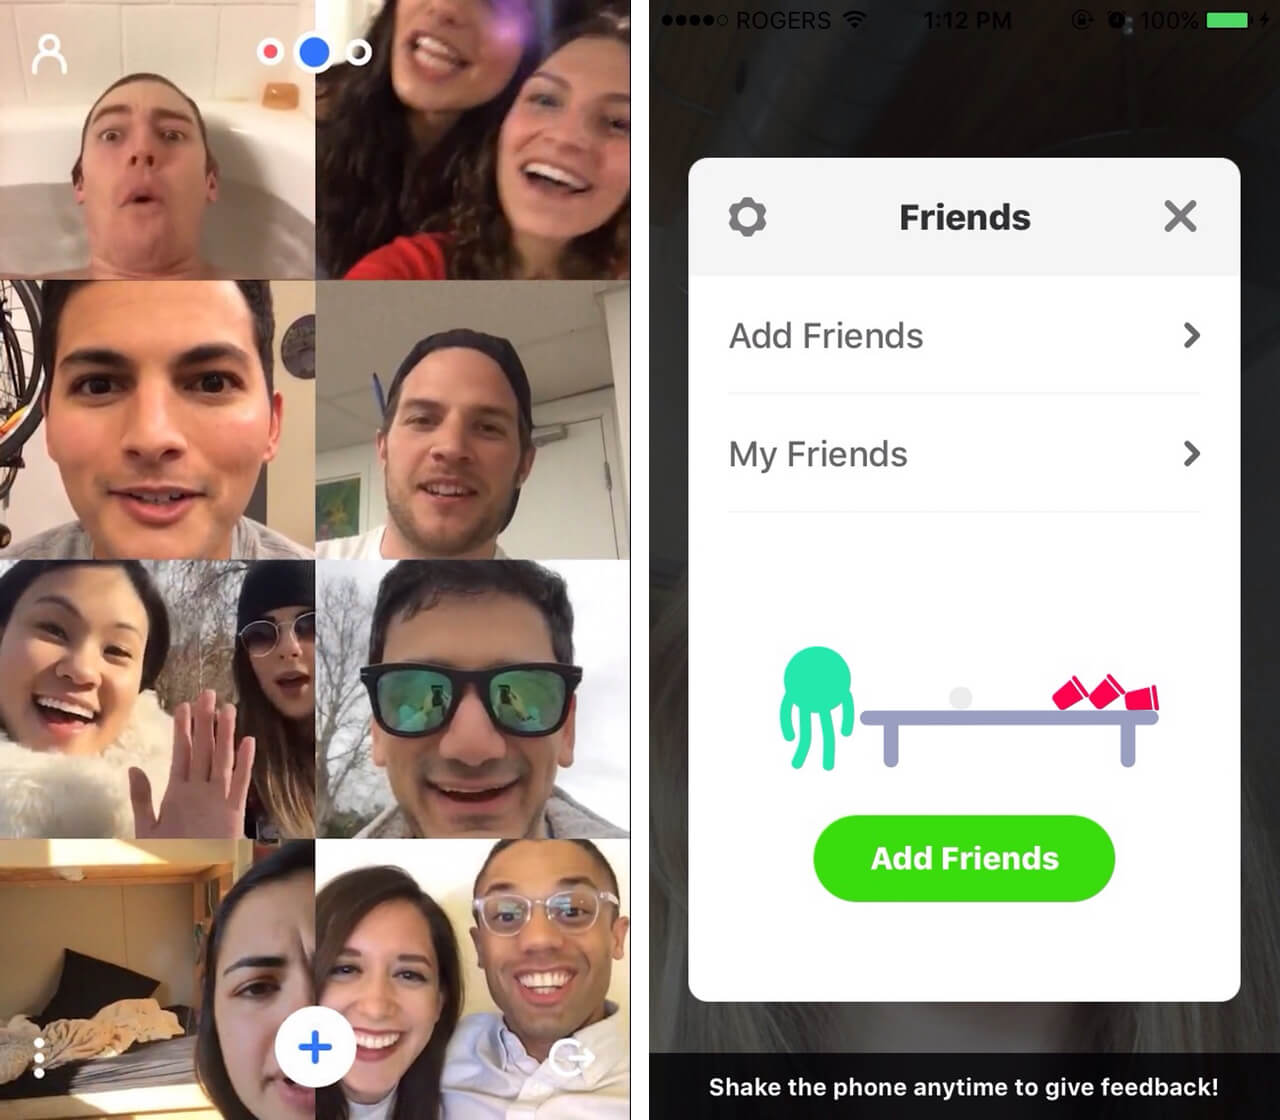 hazardous social media apps houseparty